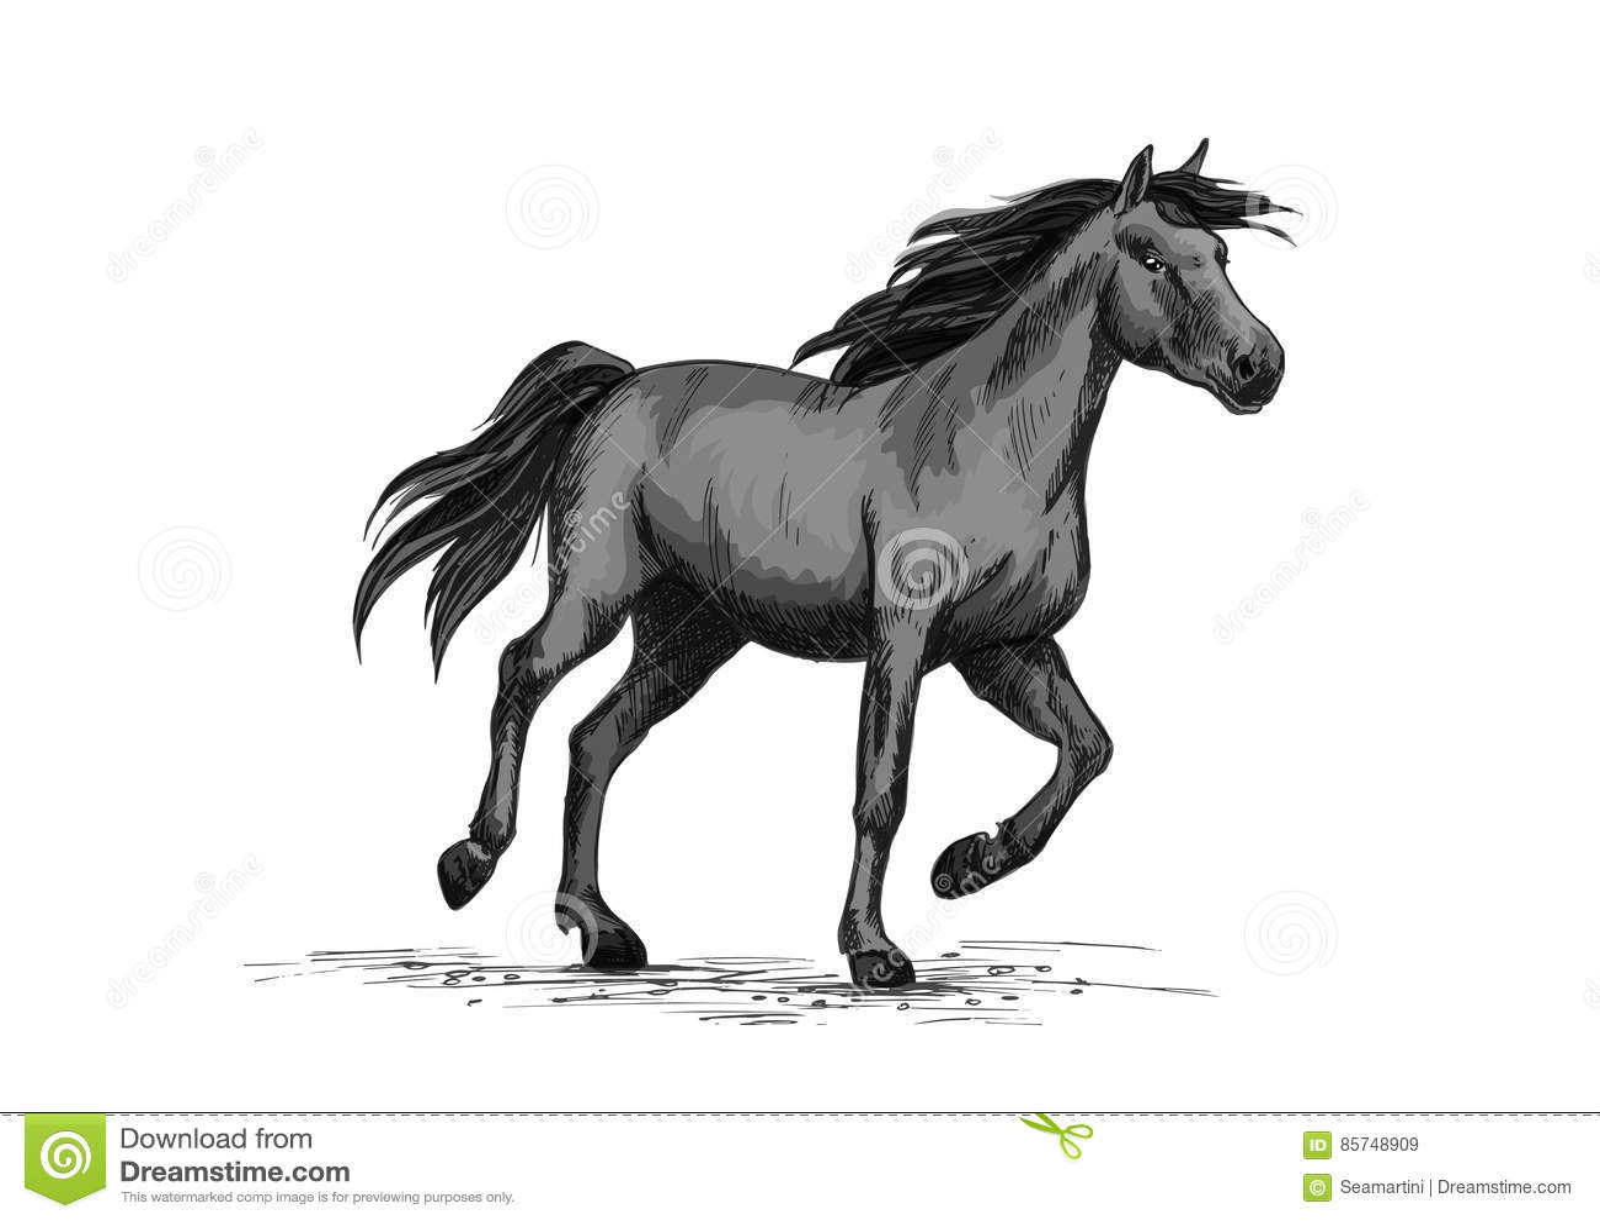 Black Wild Horse Running On Racing Sport Stock Vector Illustration Of Foal Exhibition 85748909